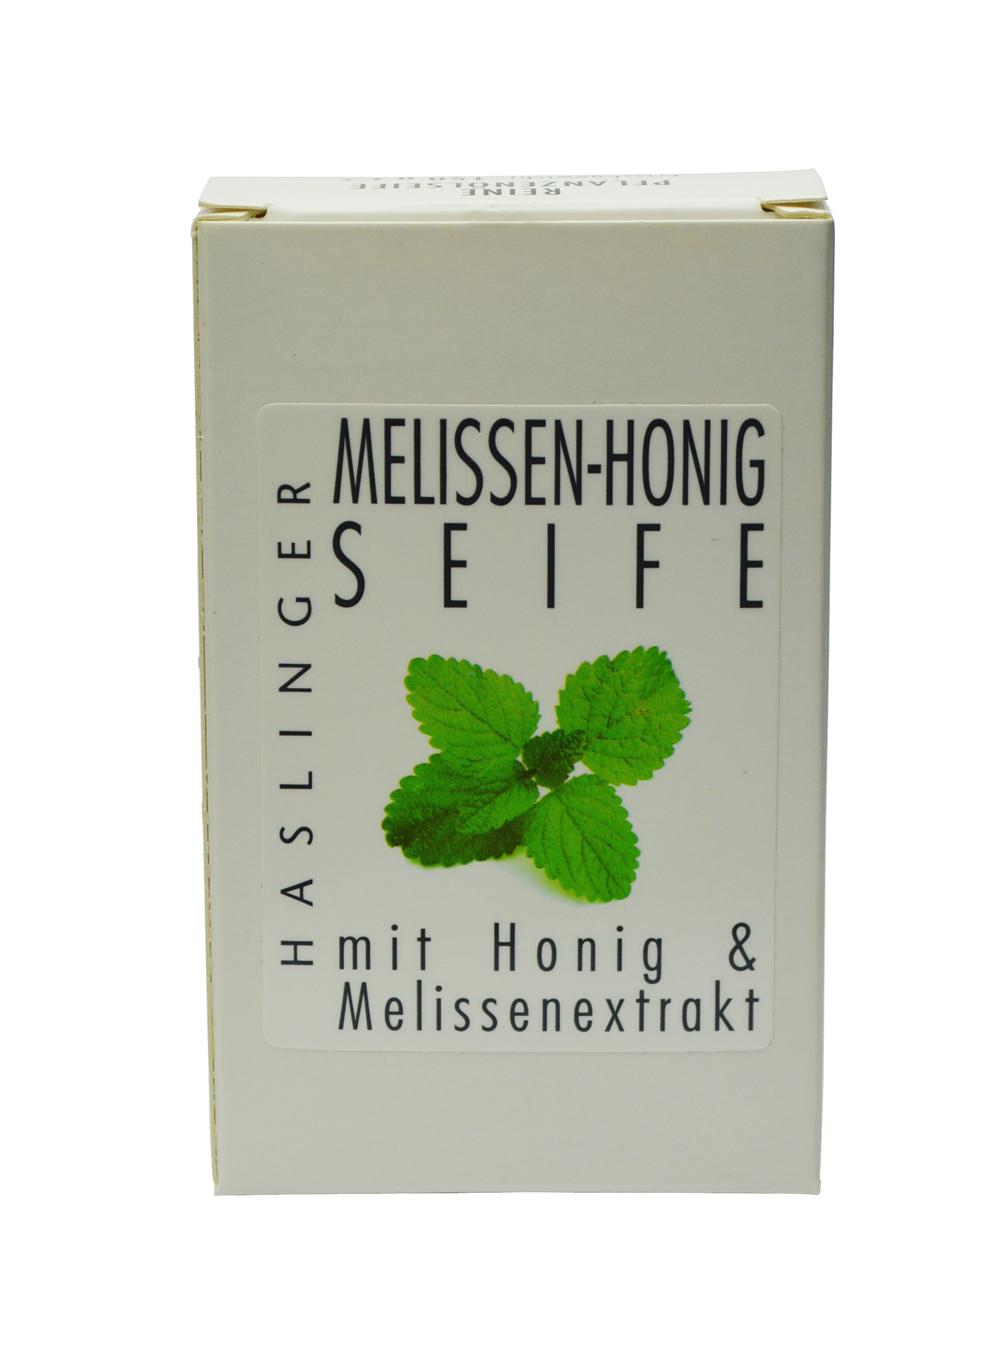 Haslinger Melissen-Honig Seife